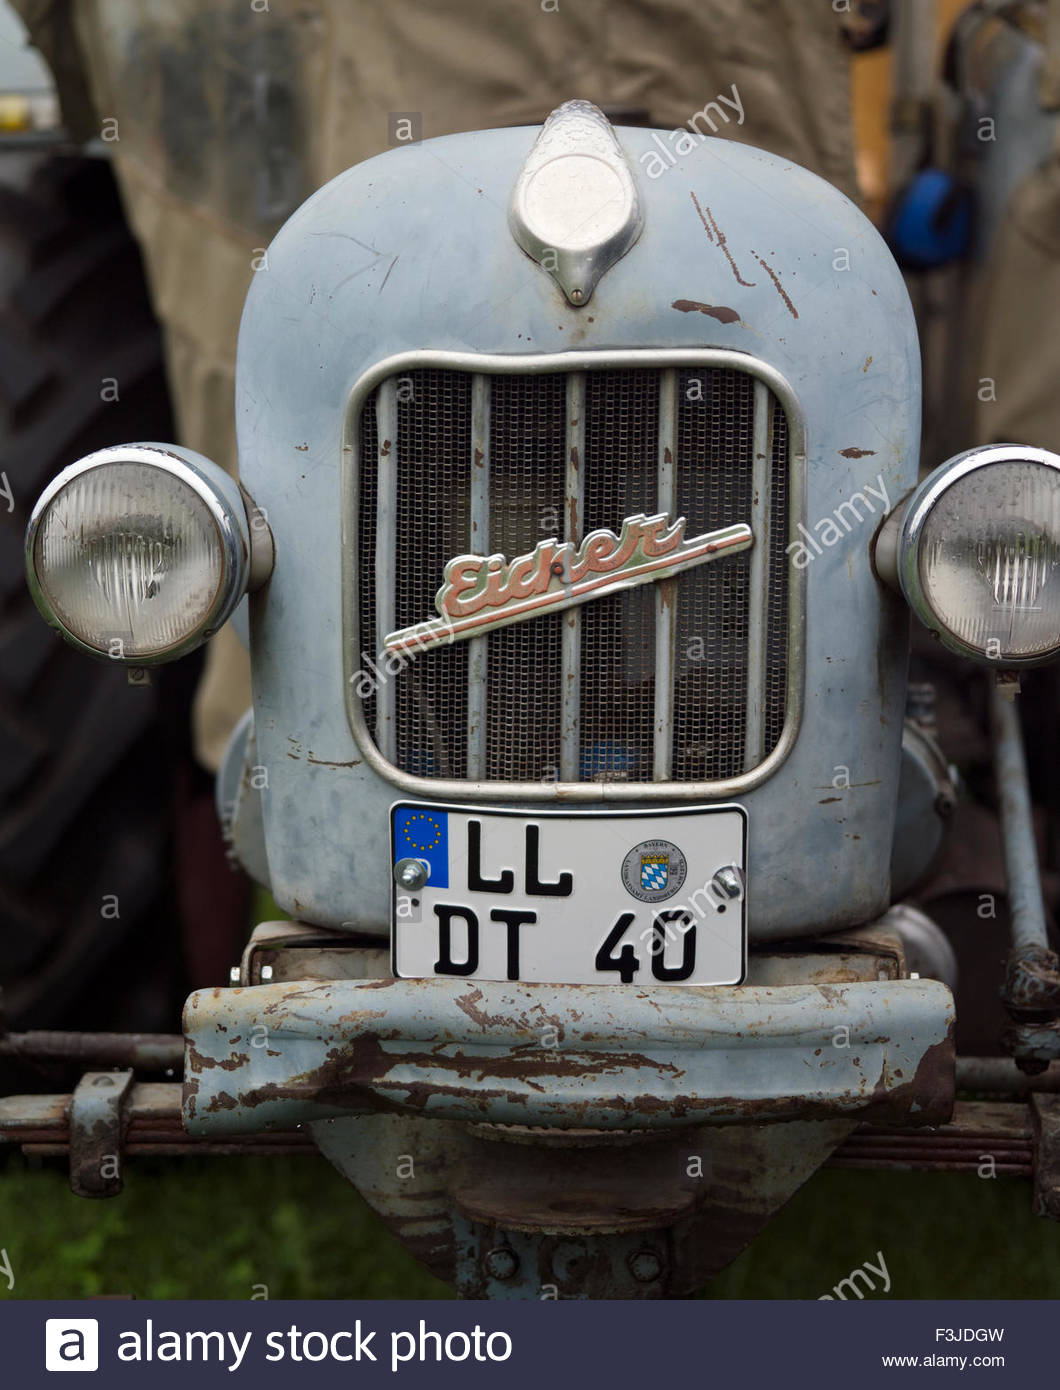 Ancient Farming Tractor - Bavaria Germany - Stock Image